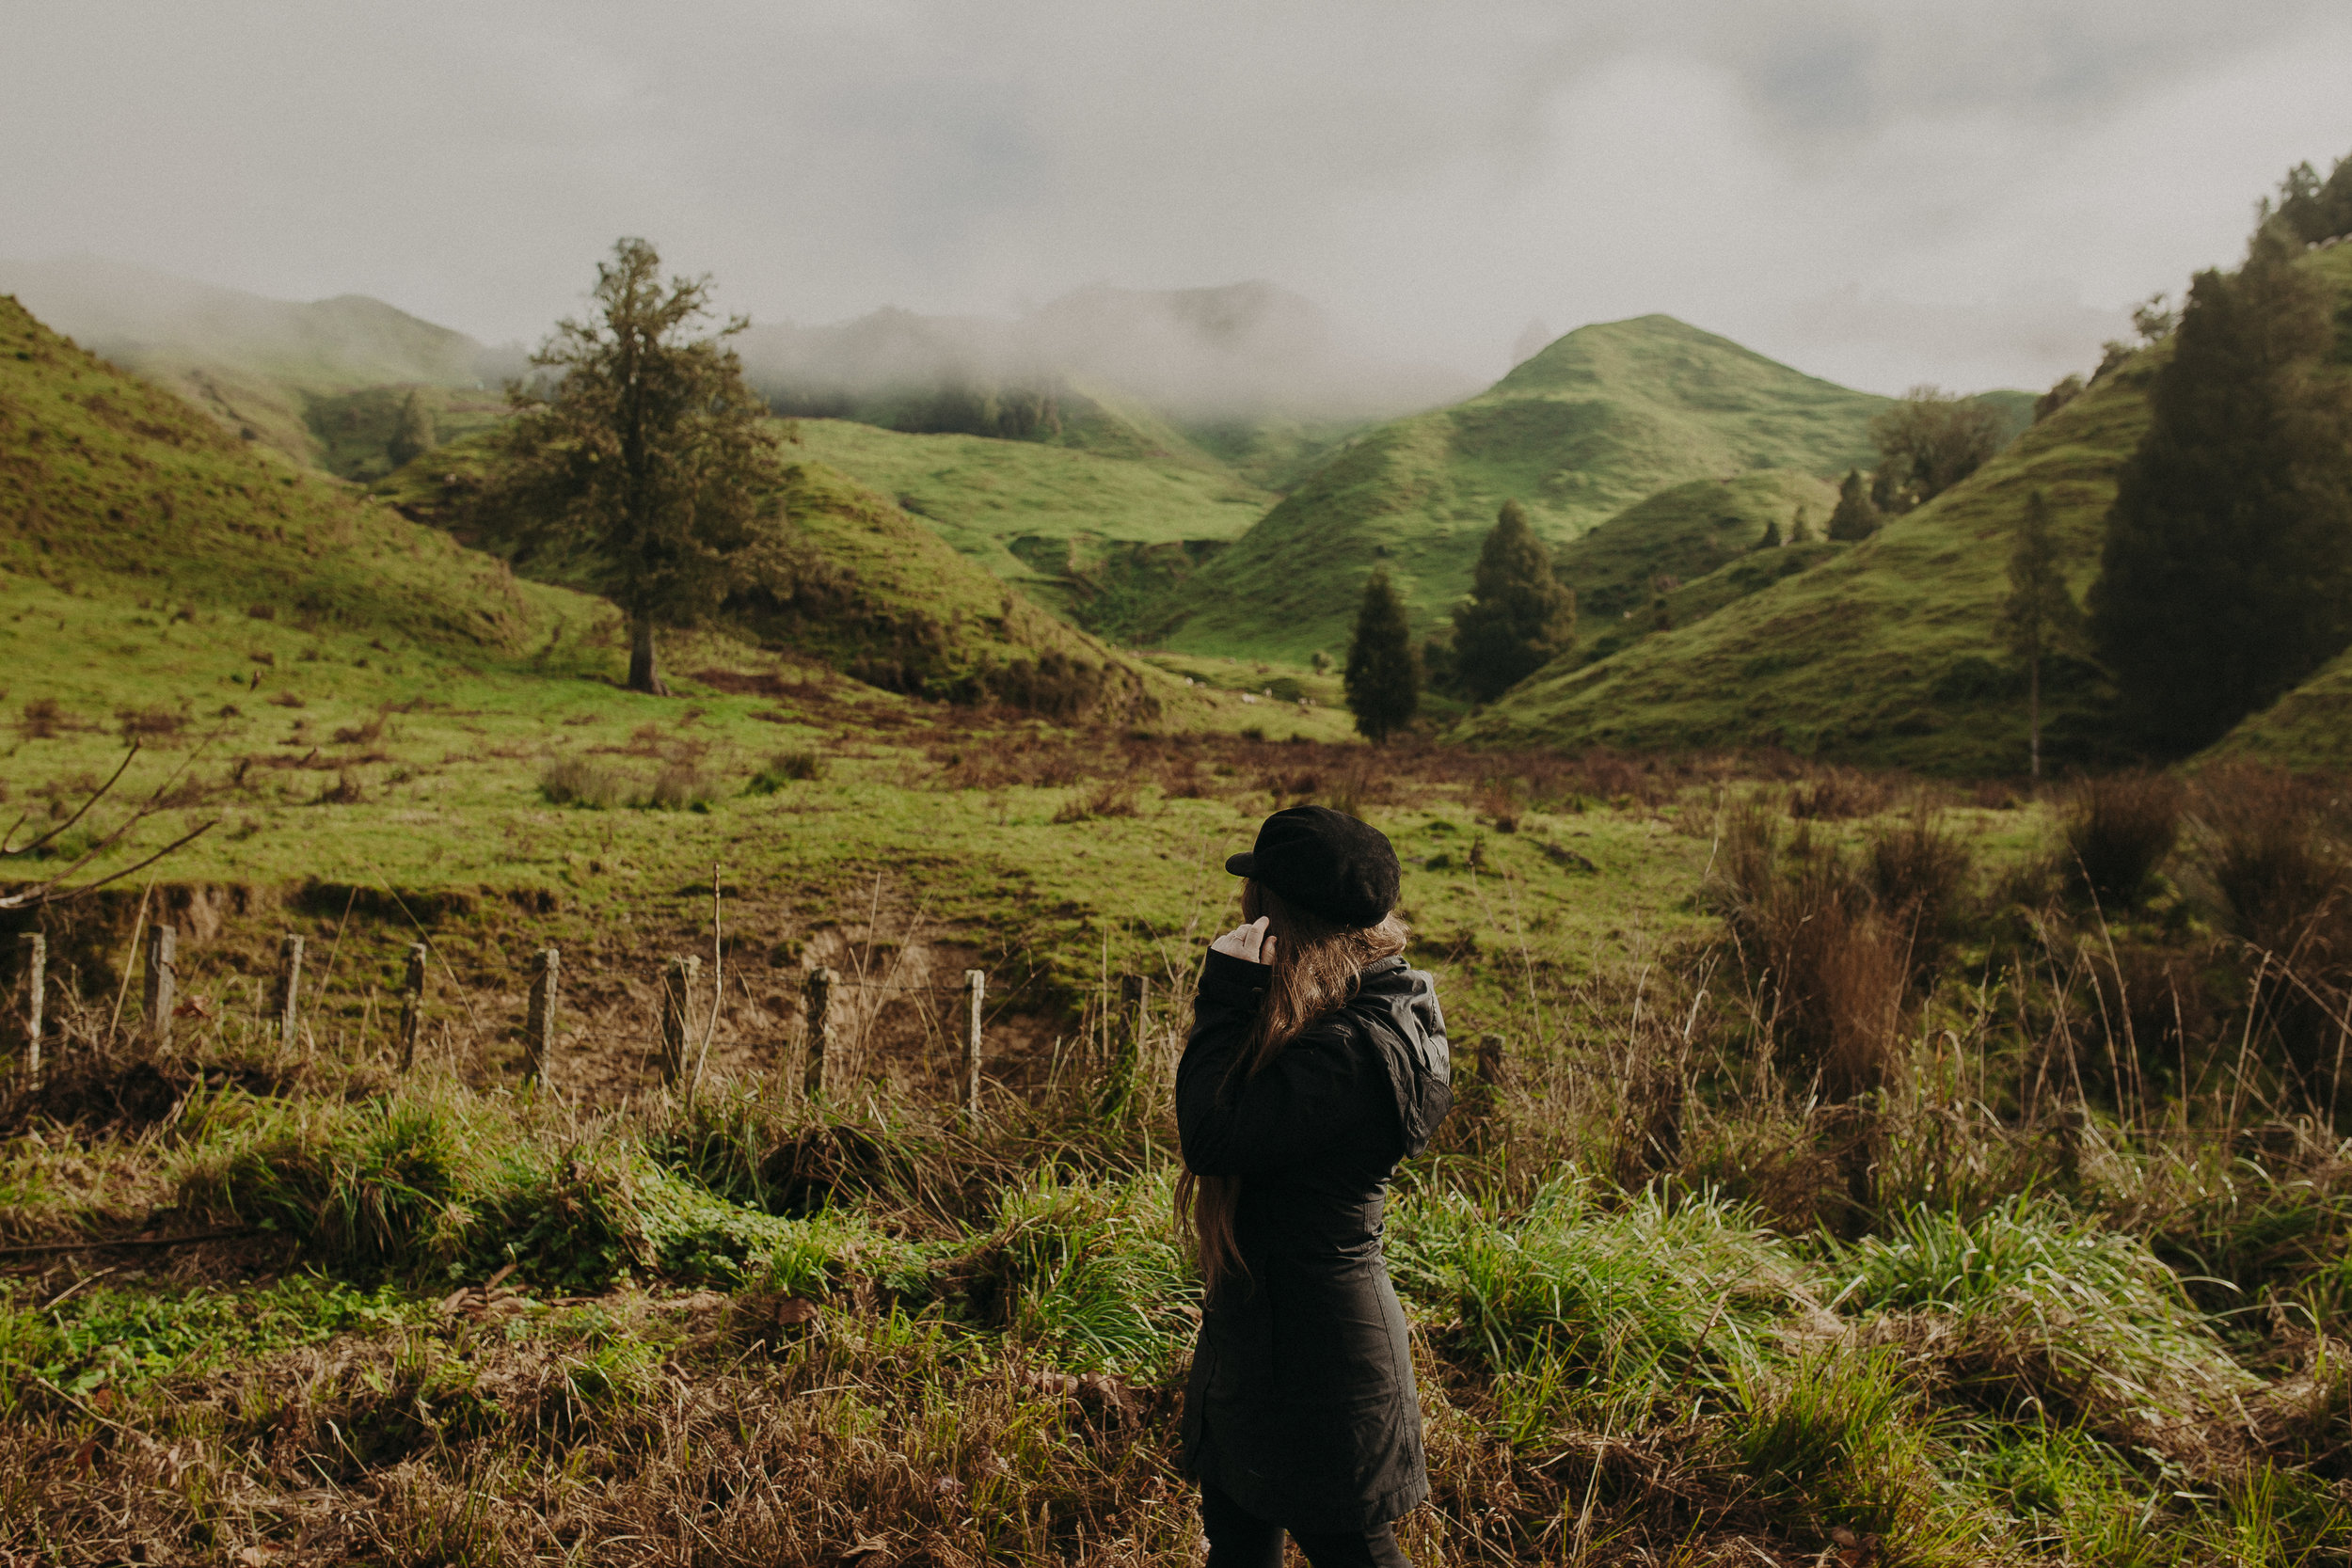 Forgotten-World-Highway-New-Zealand-5.jpg